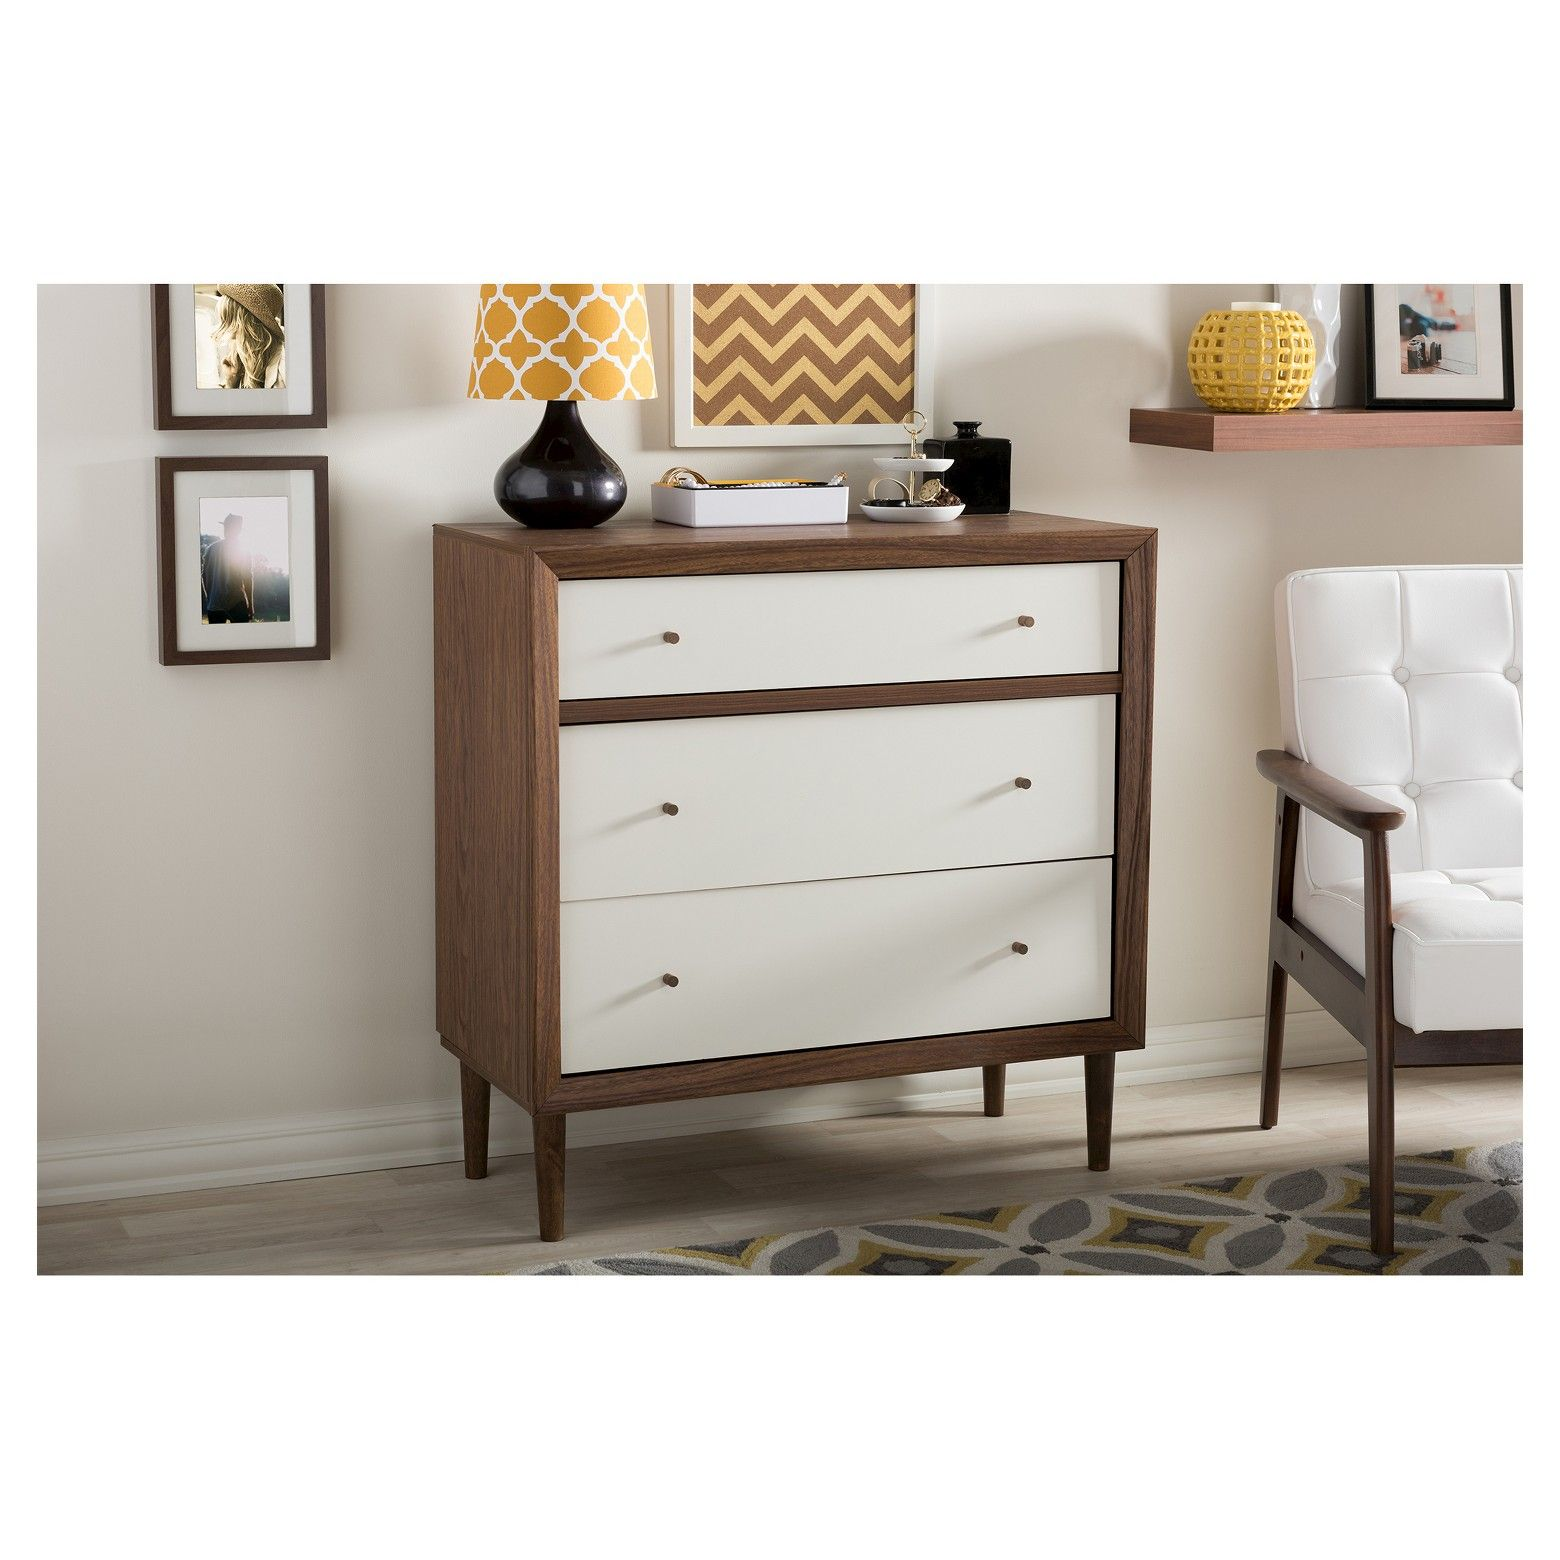 Harlow Mid Century Modern Scandinavian Style Wood 3 Drawer Chest White And Walnut Baxton Studio Furniture 3 Drawer Chest White Interior Design